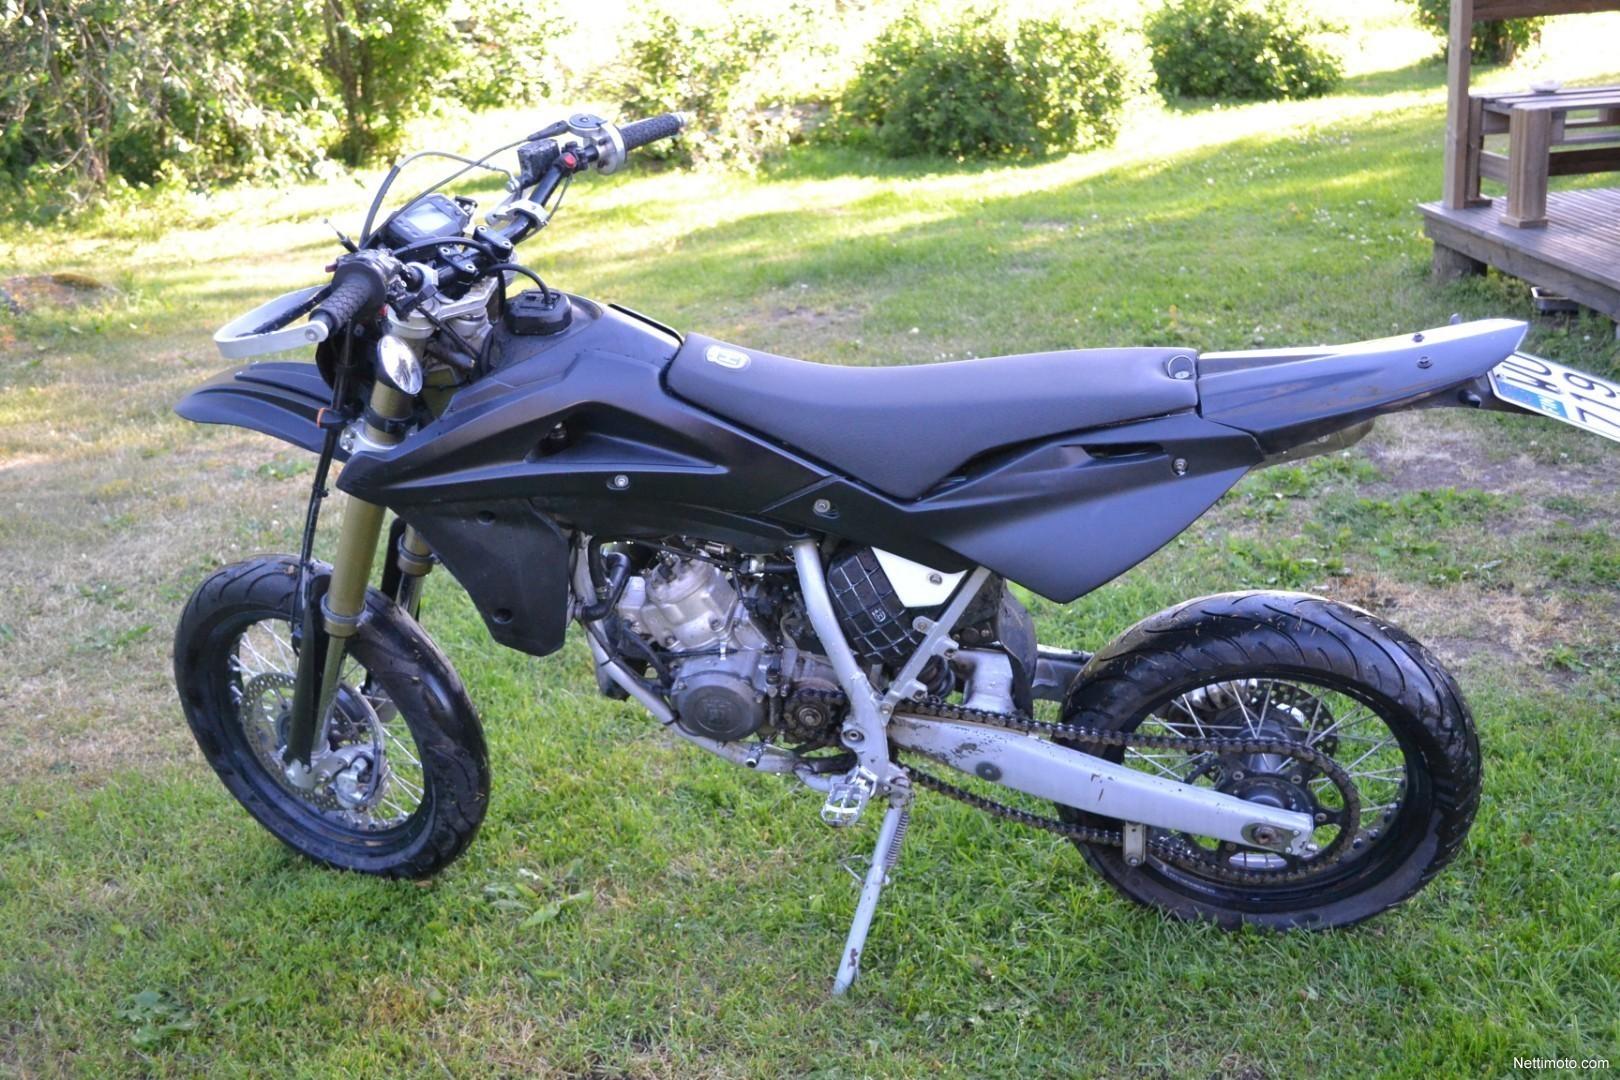 Husqvarna Sm 125 125 Cm U00b3 2008 - Hattula - Motorcycle